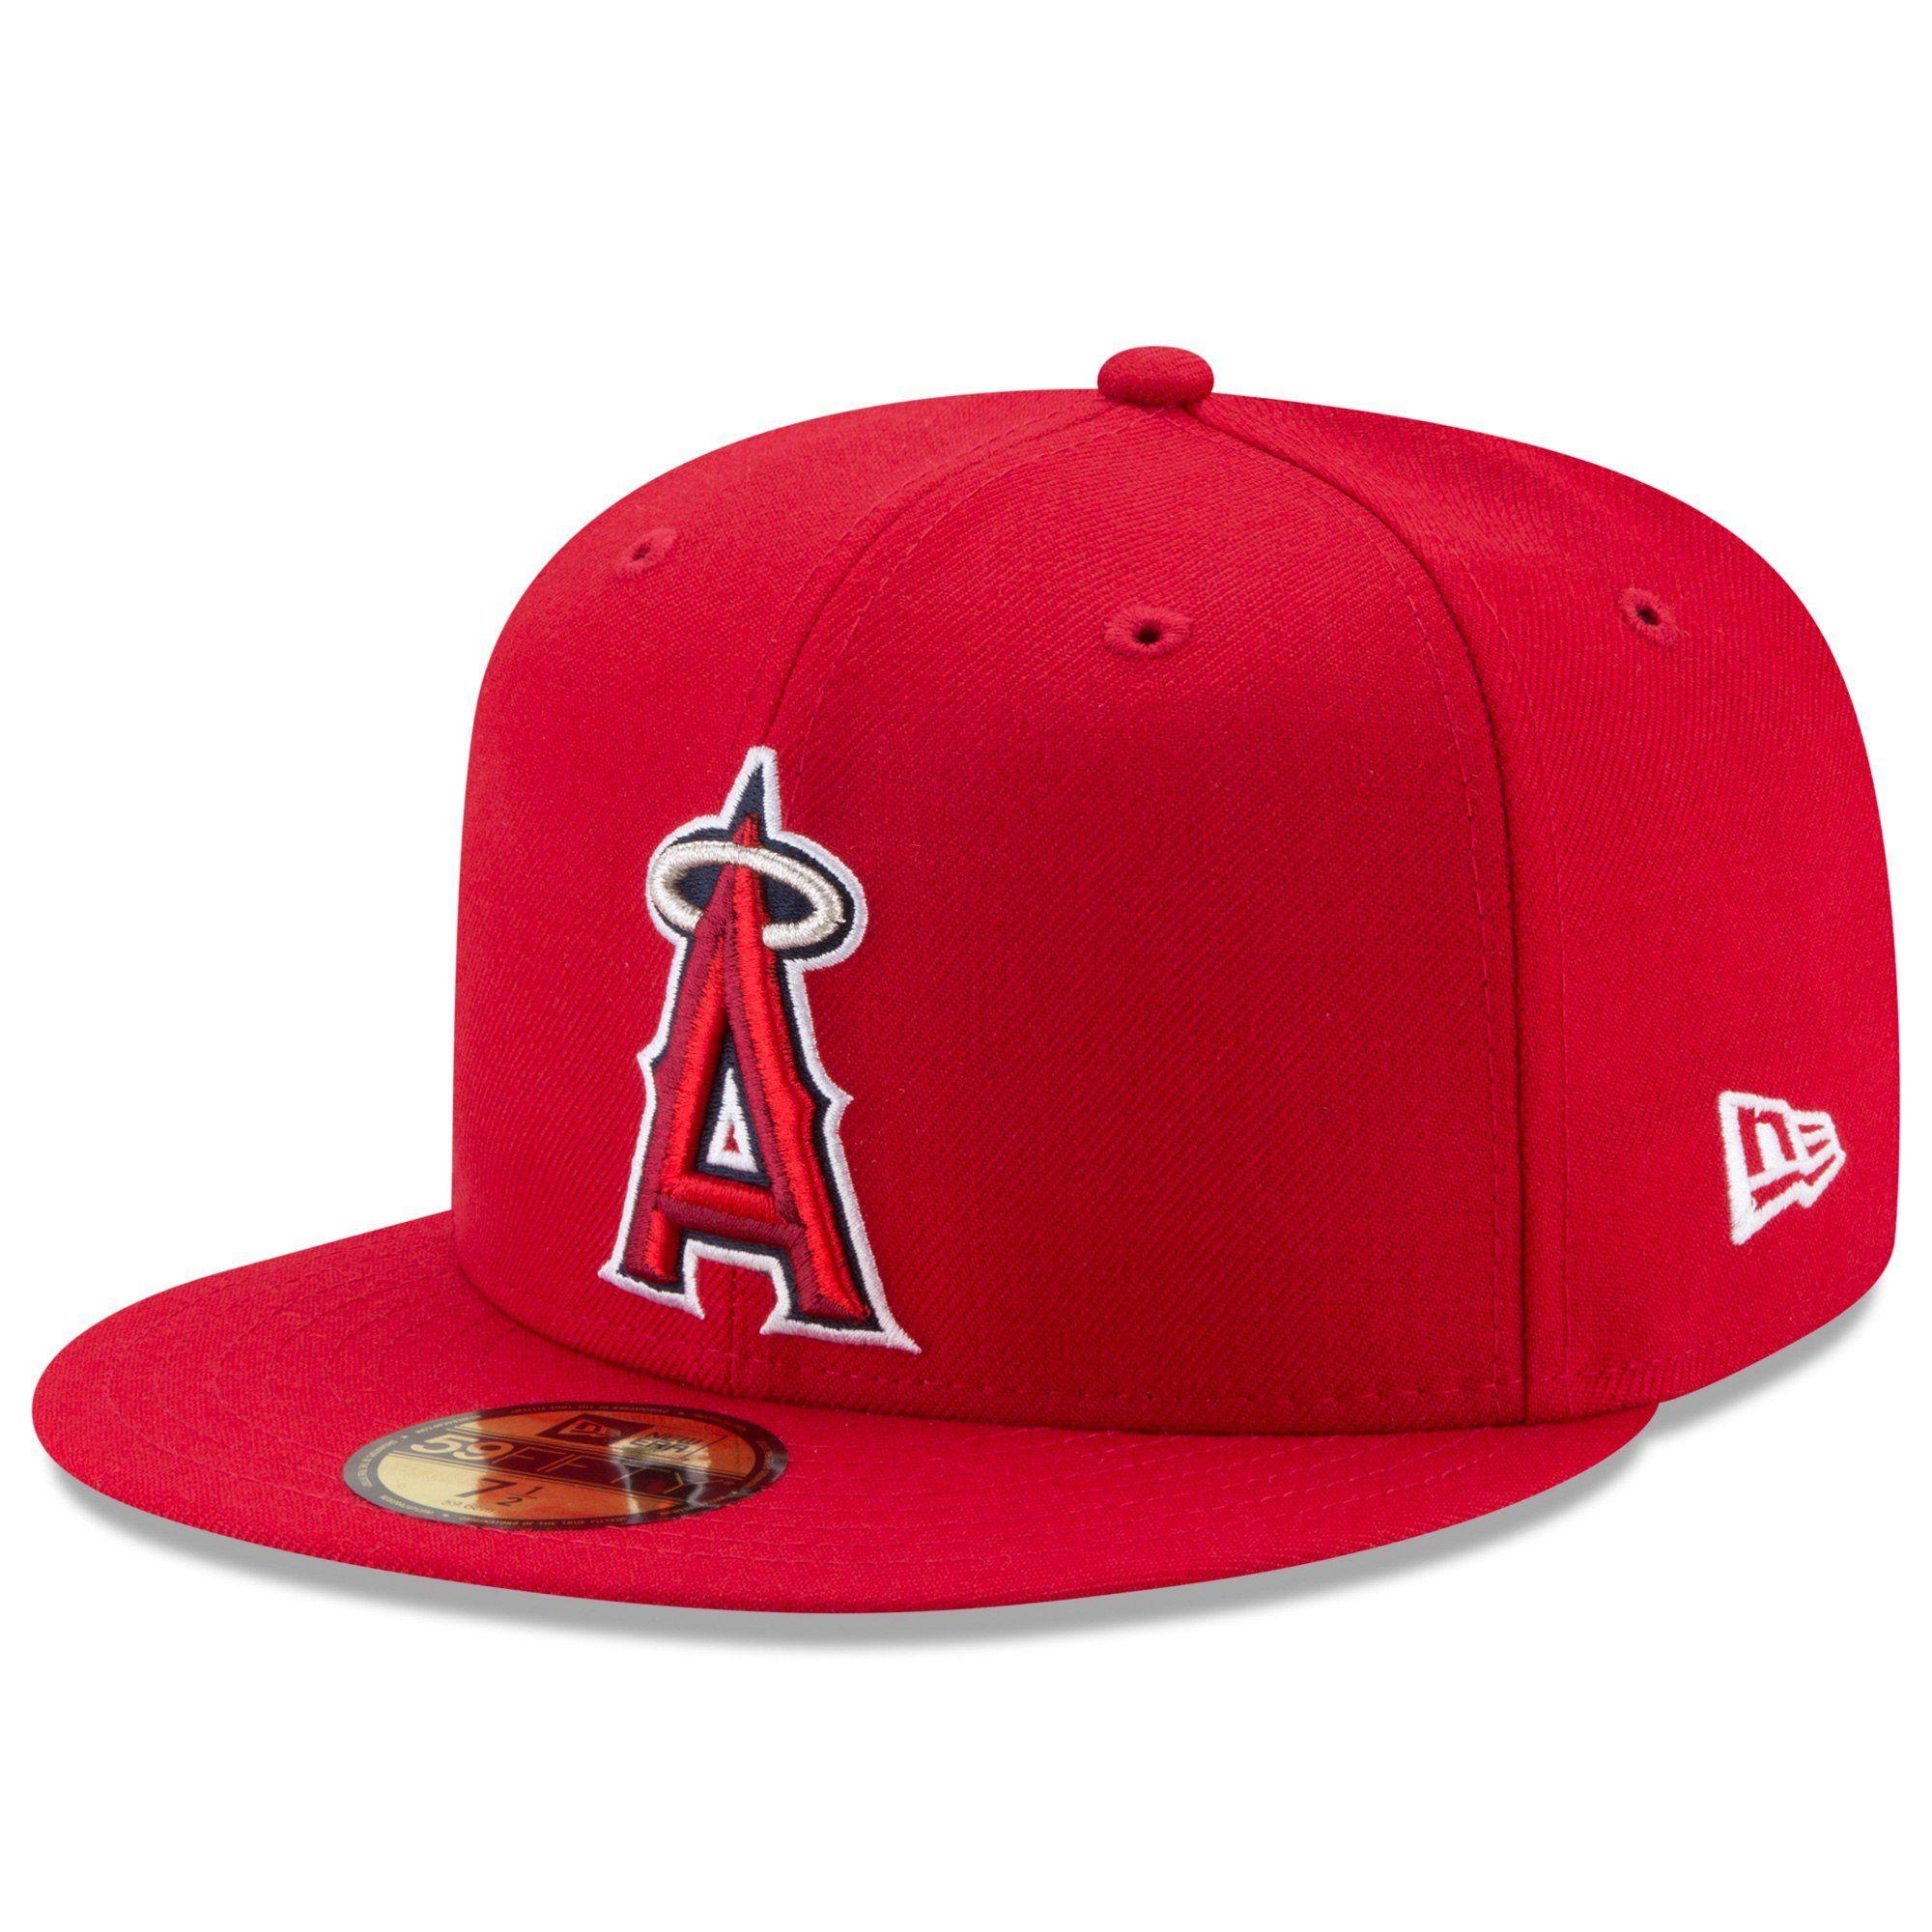 312e1f70368 New Era 59fifty MLB On Field Fitted Hat Cap - Anaheim LA Angels Game ...